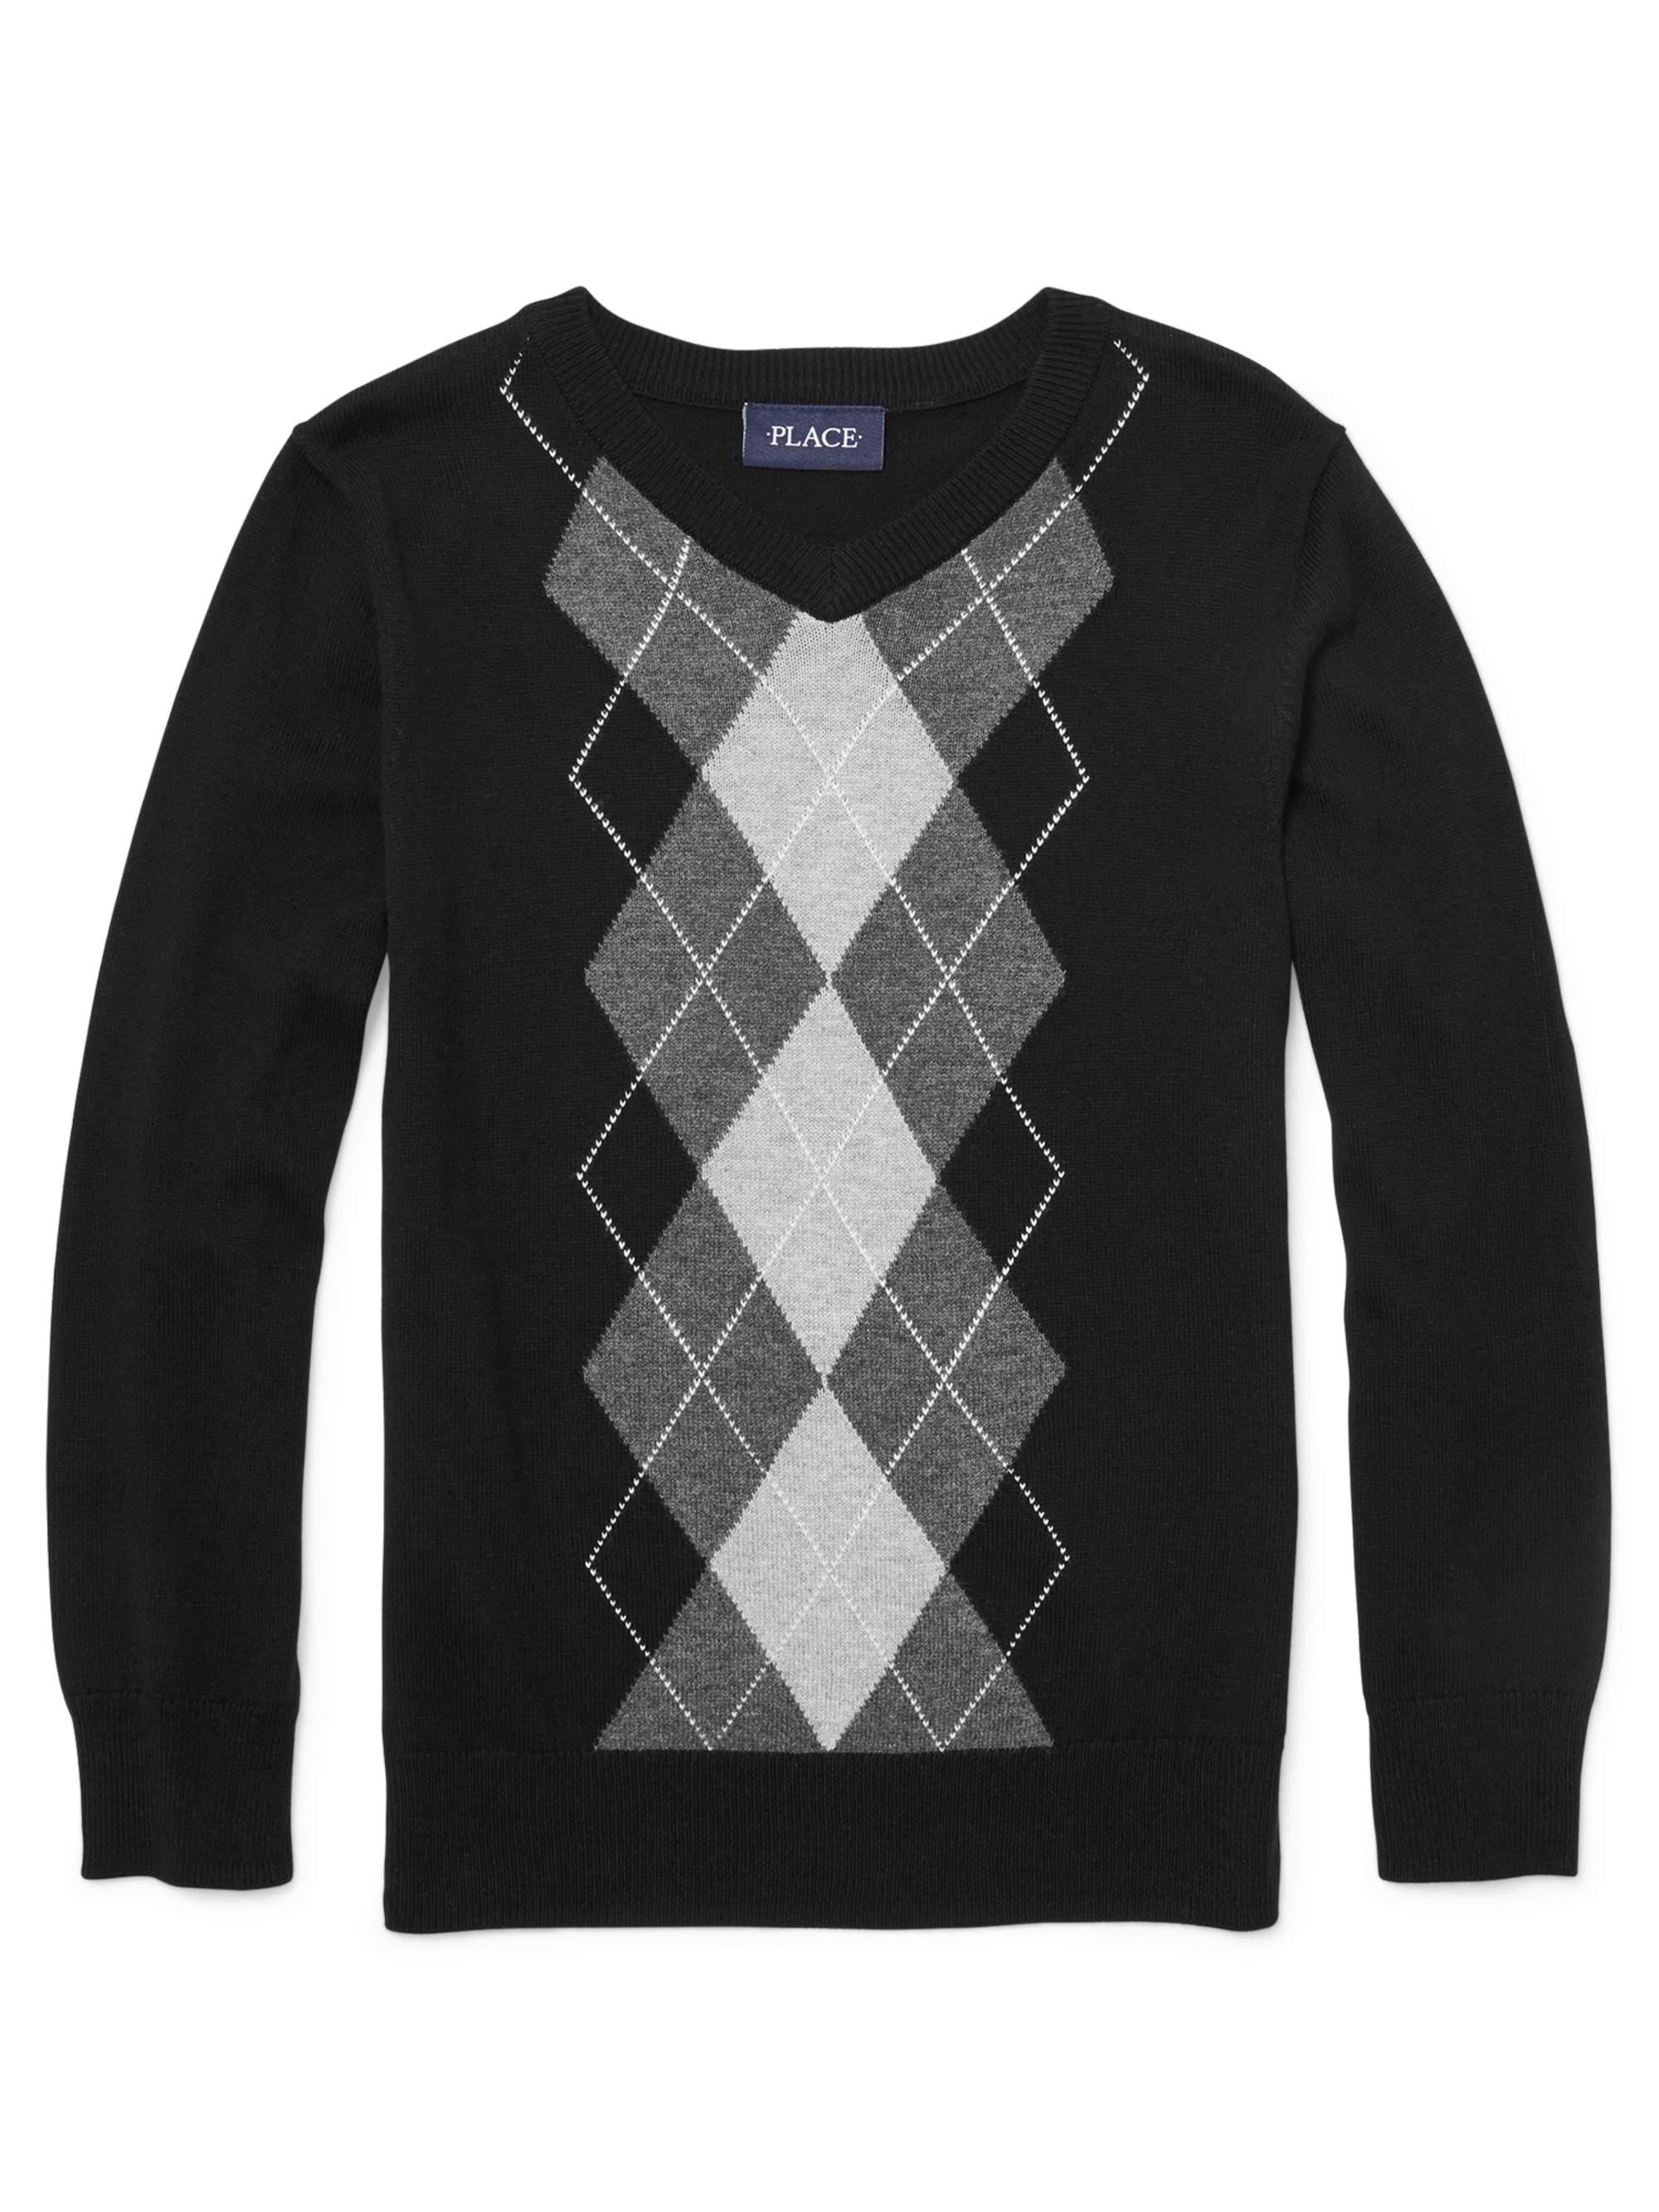 Pull Over Argyle Sweater (Little Boy & Big Boy)